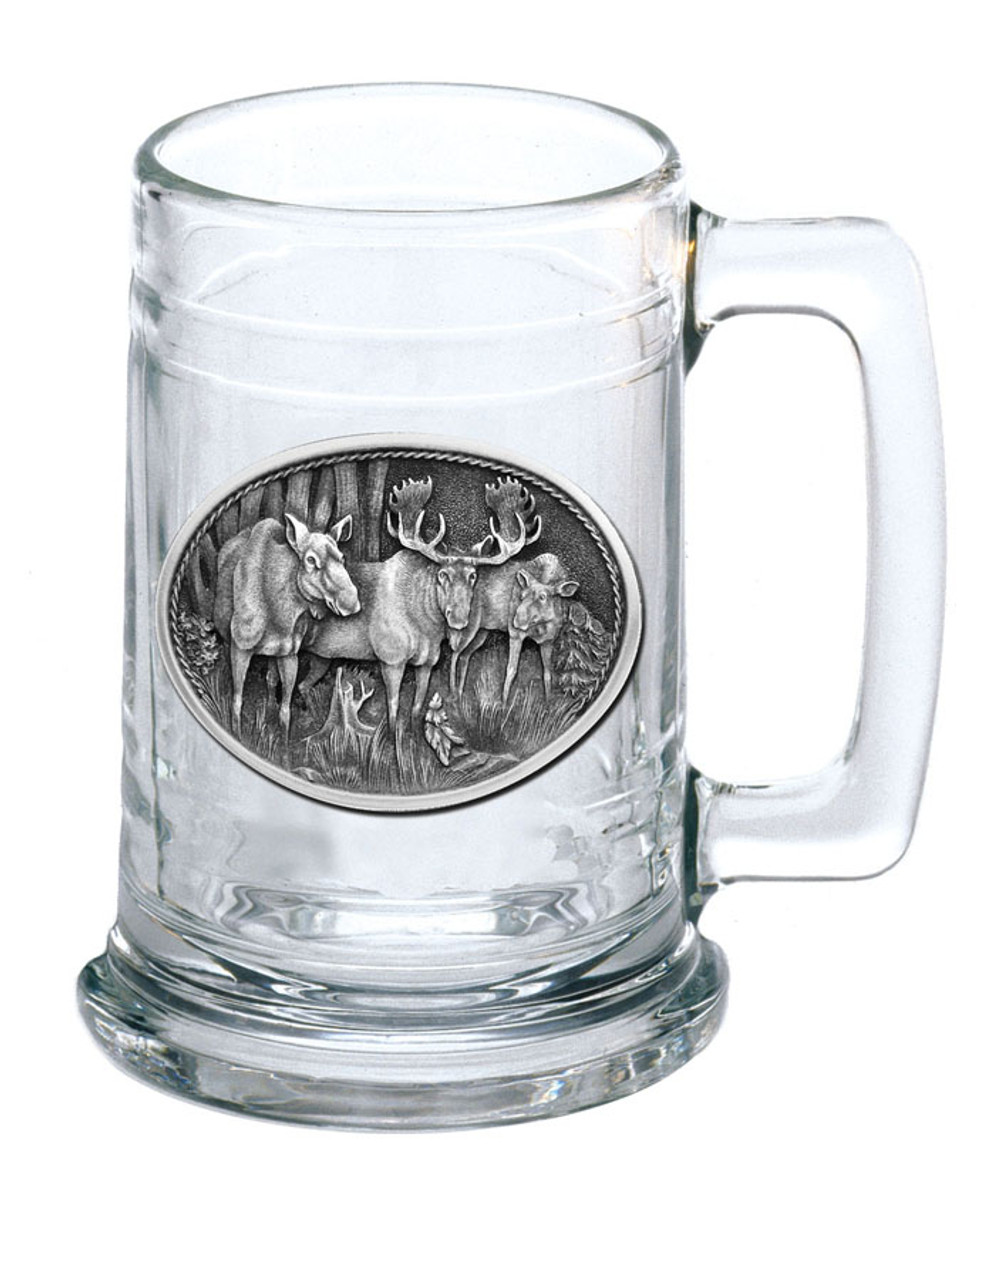 Glass Stein 15oz with Wildlife Pewter